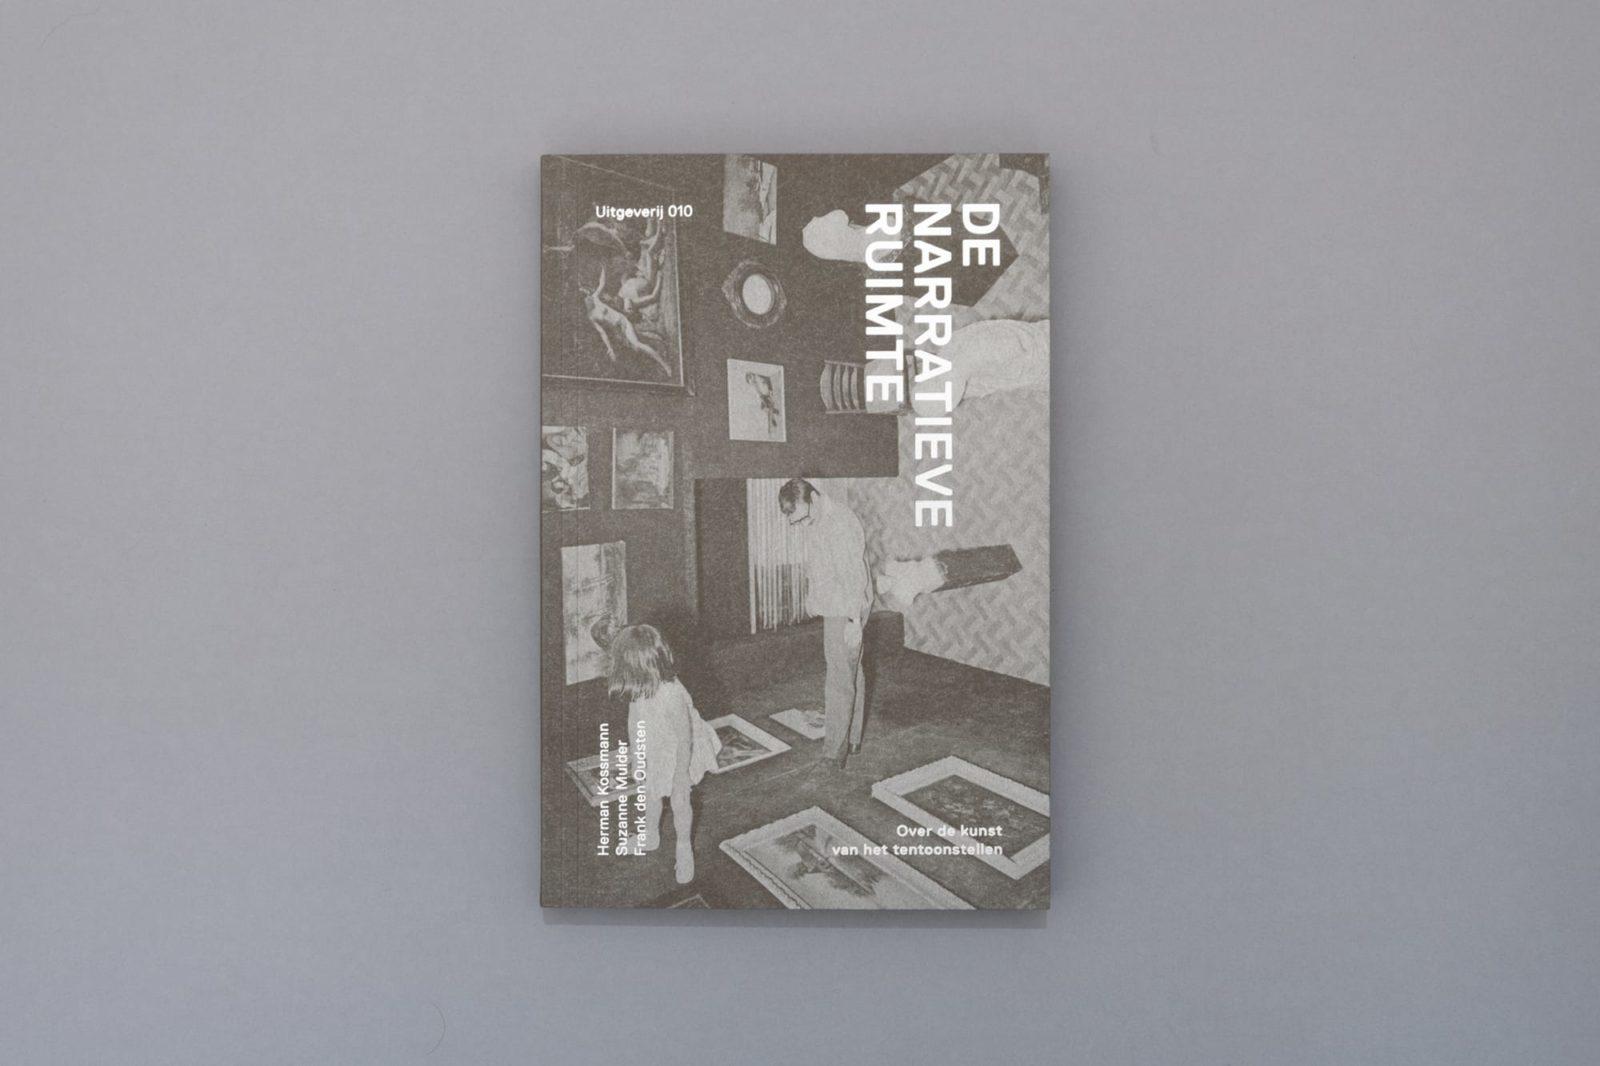 Haller Brun Narrative Spaces De narrative ruimte book exhibition design theory history 010 publishers